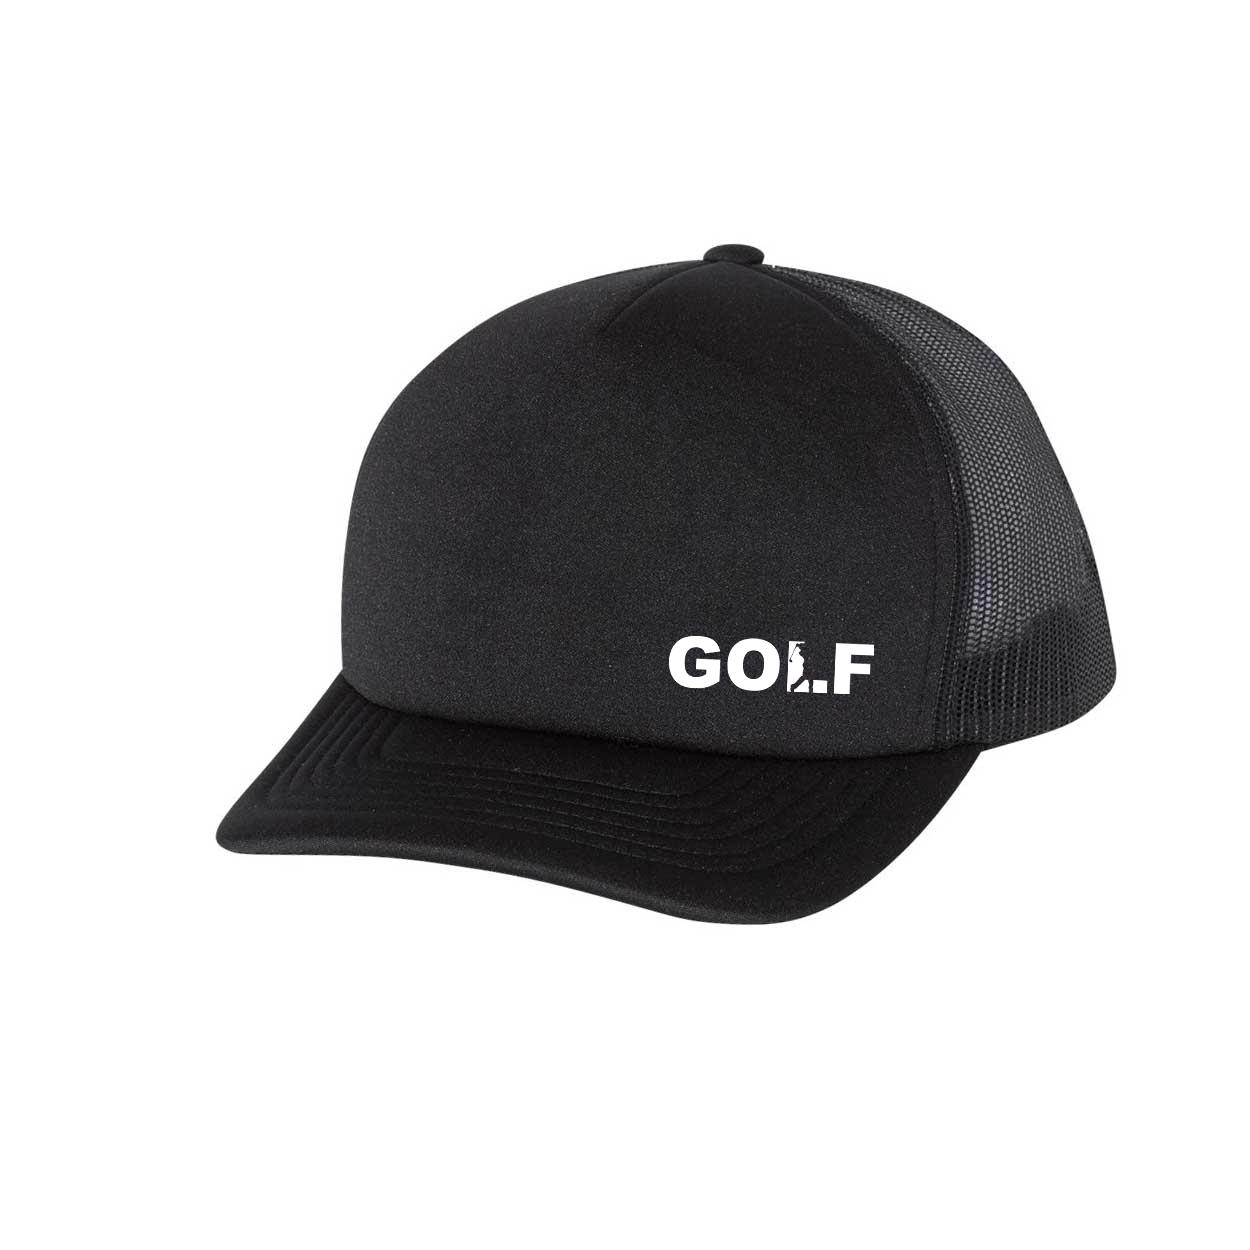 Golf Swing Logo Night Out Premium Foam Trucker Snapback Hat Black (White Logo)